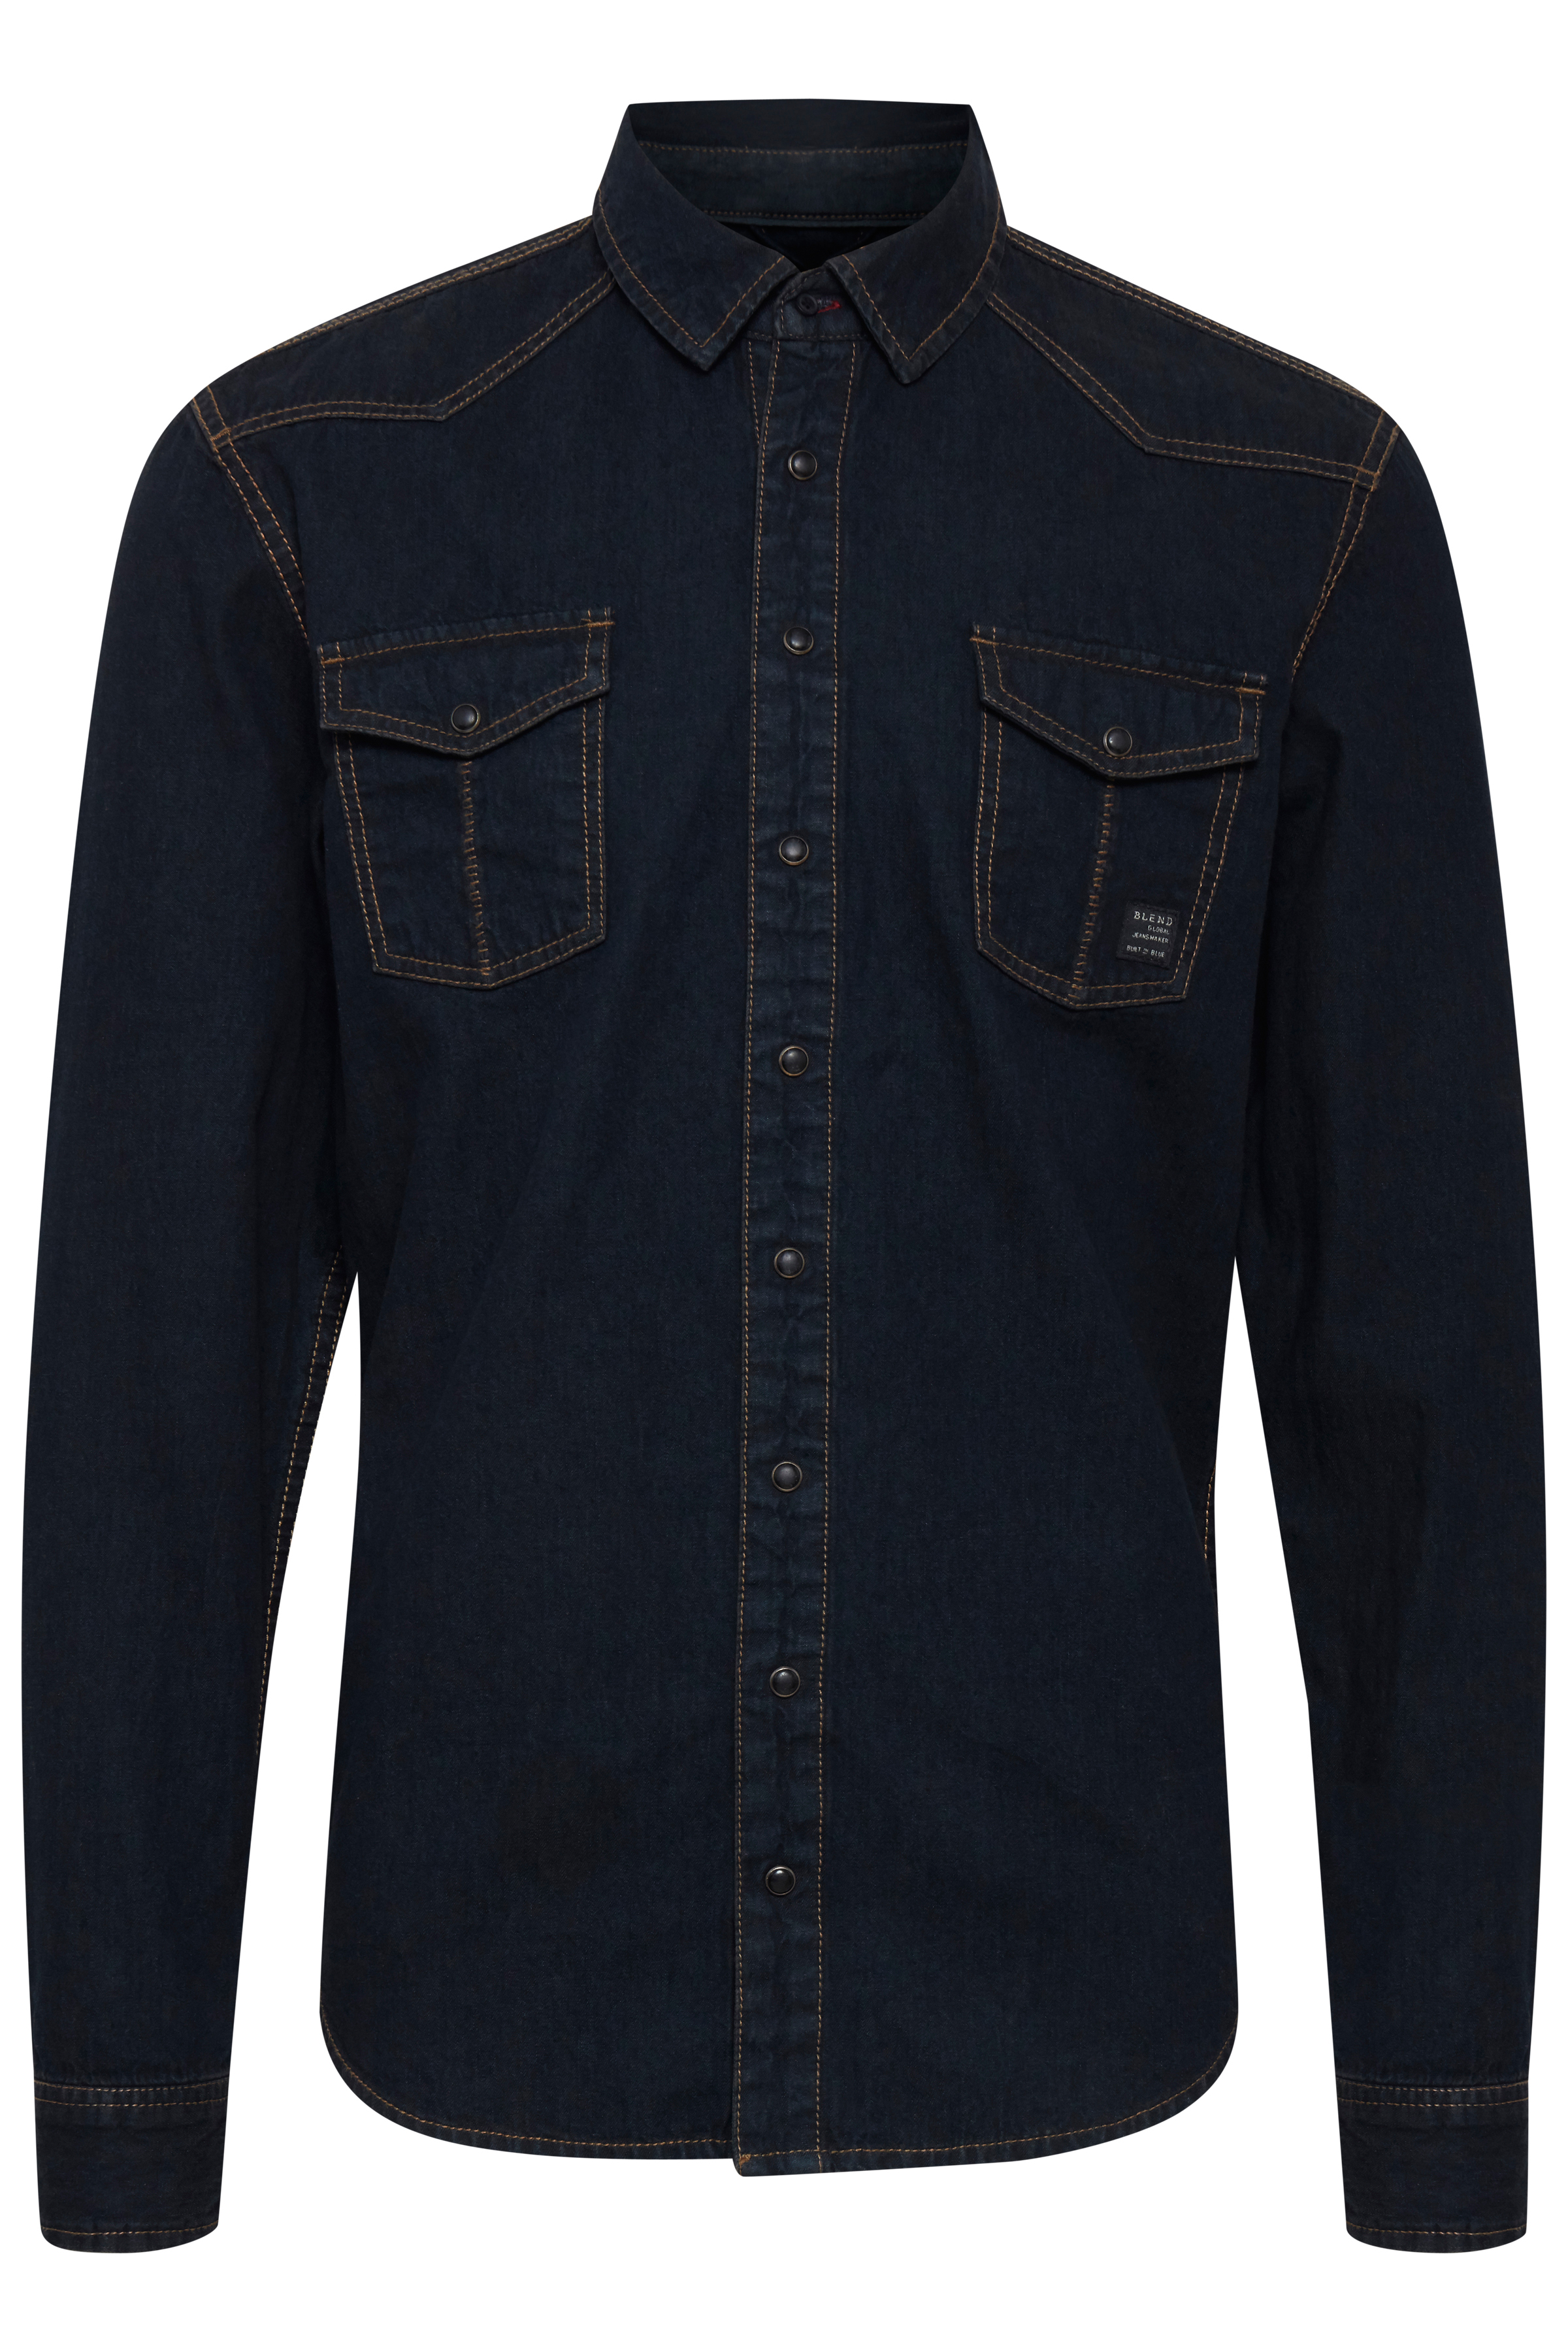 Image of Blend He Herre Langærmet skjorte - Denim Black Blue